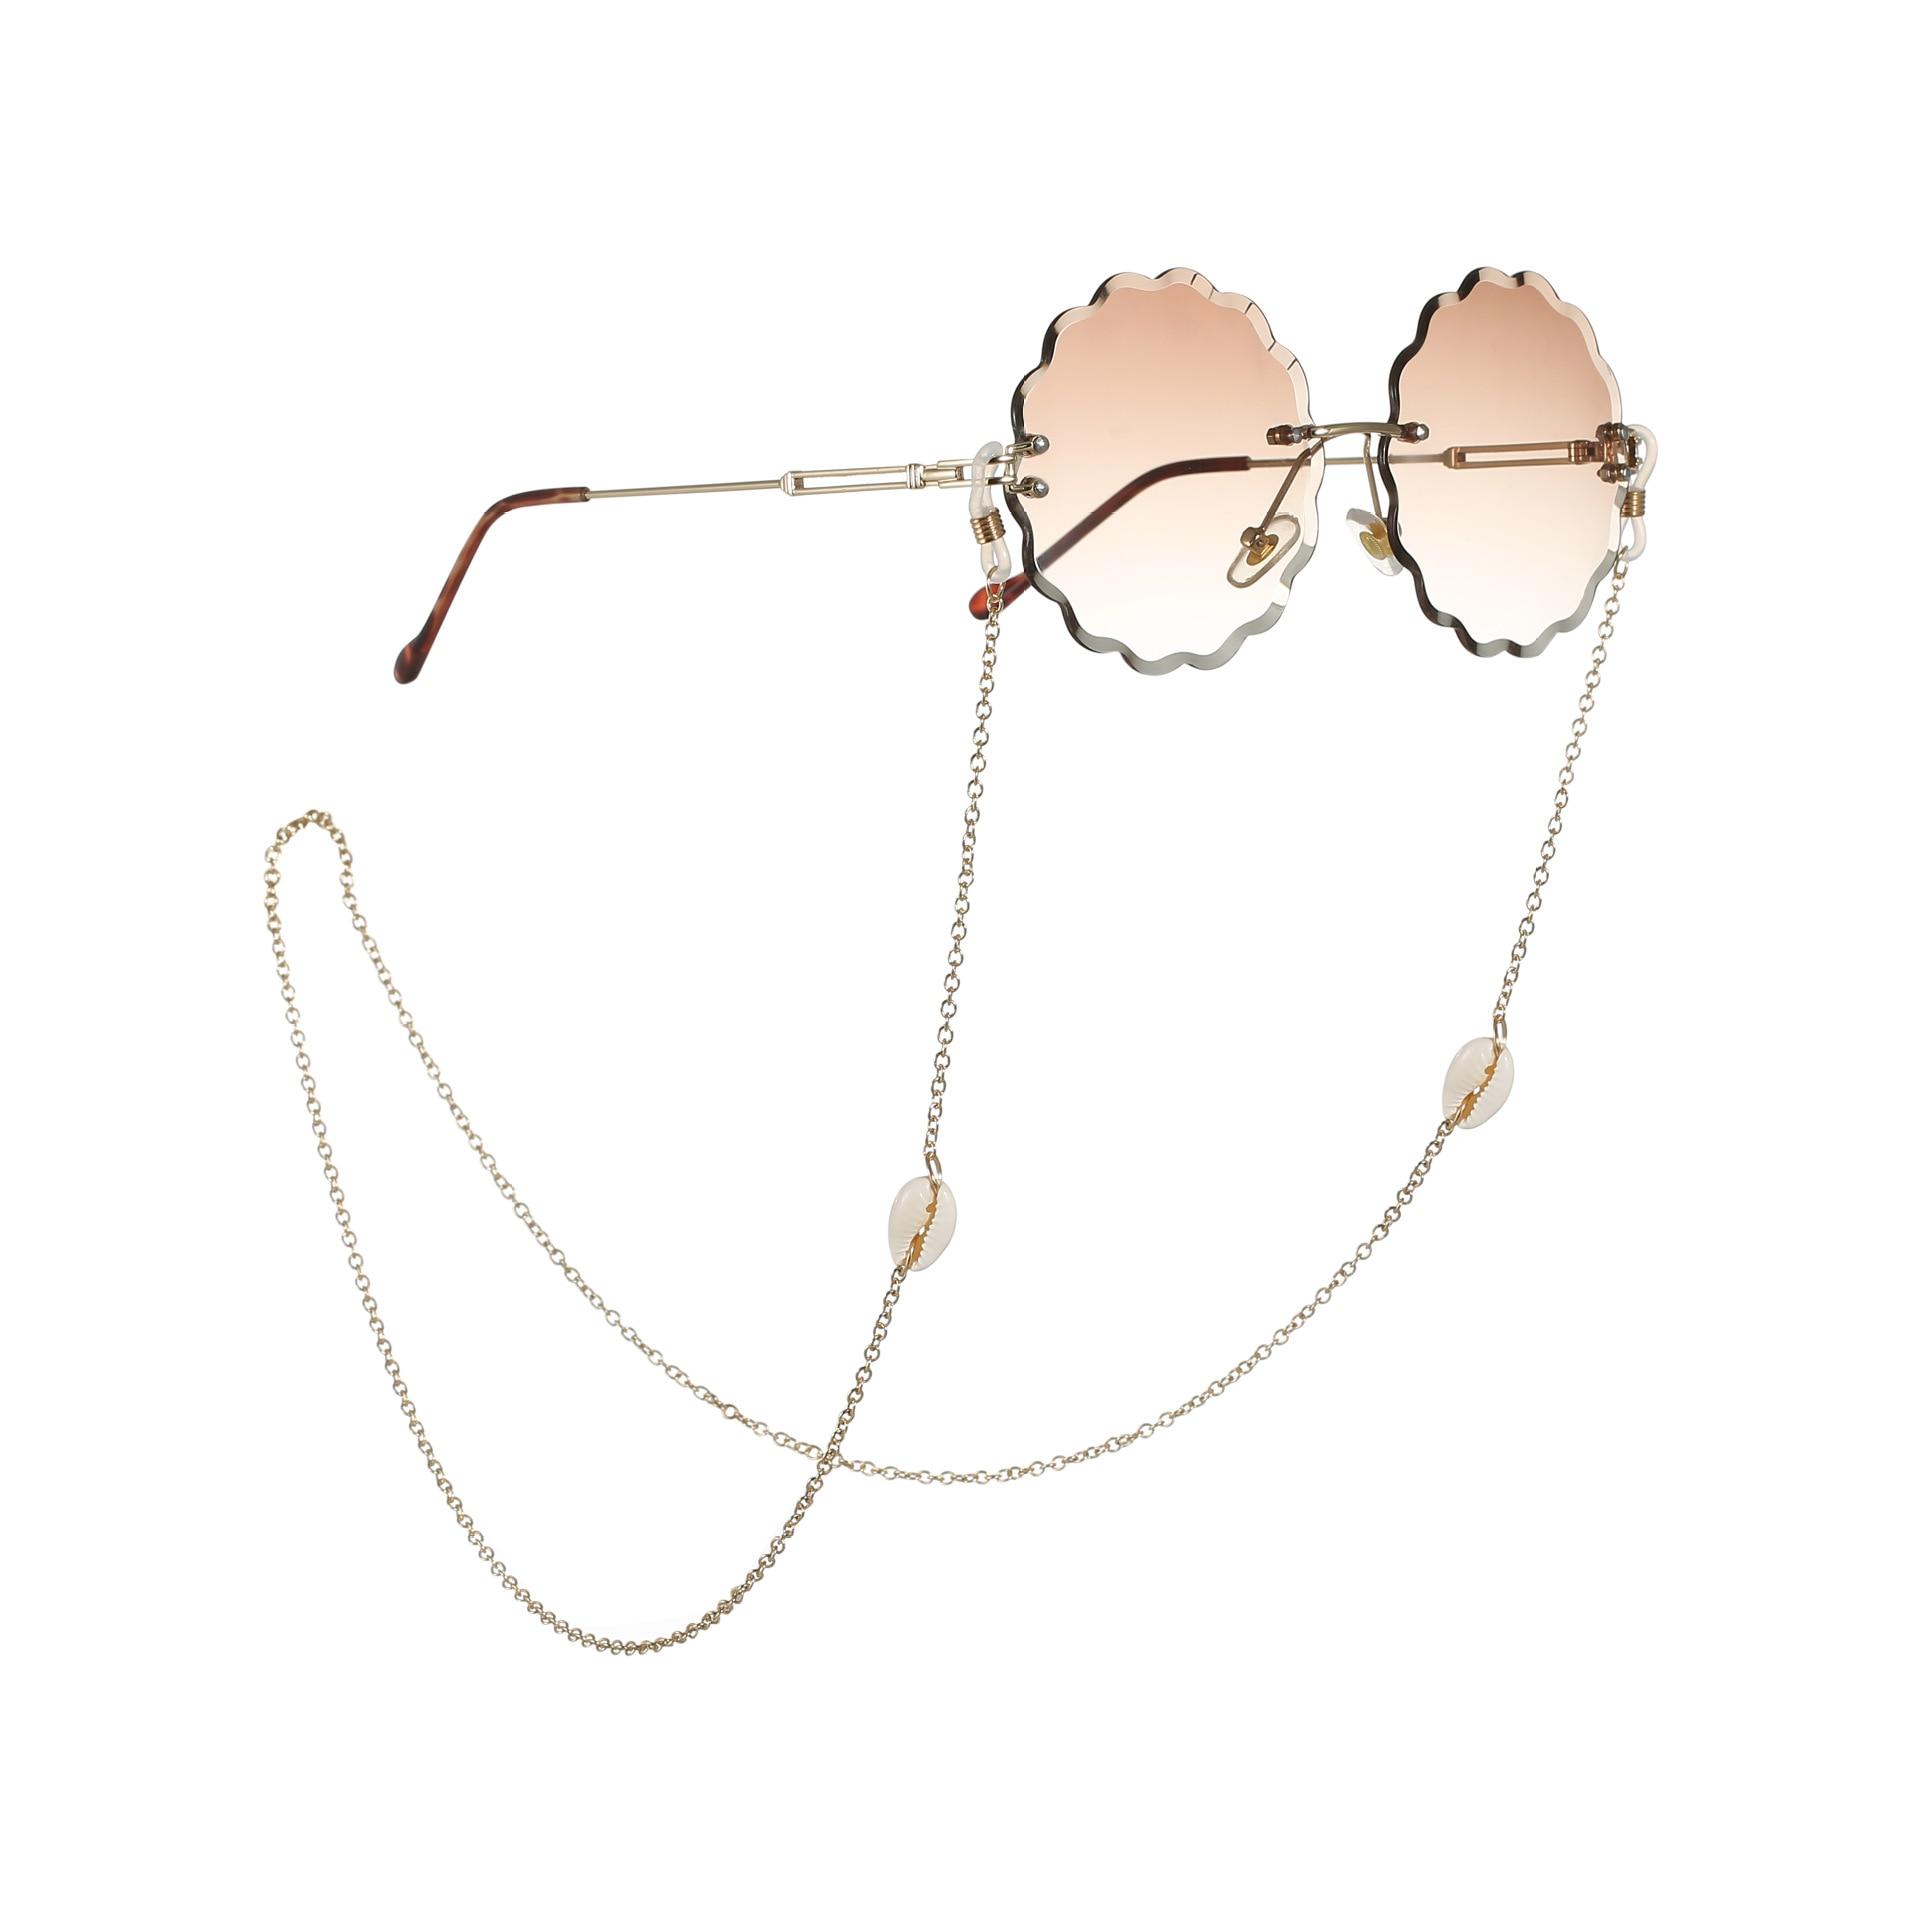 New Women Conch Shell Reading Glasses Chain Sunglasses Cord Holder Neck Strap Rope Necklace Anti-skidding Men Eyeglass Lanyard